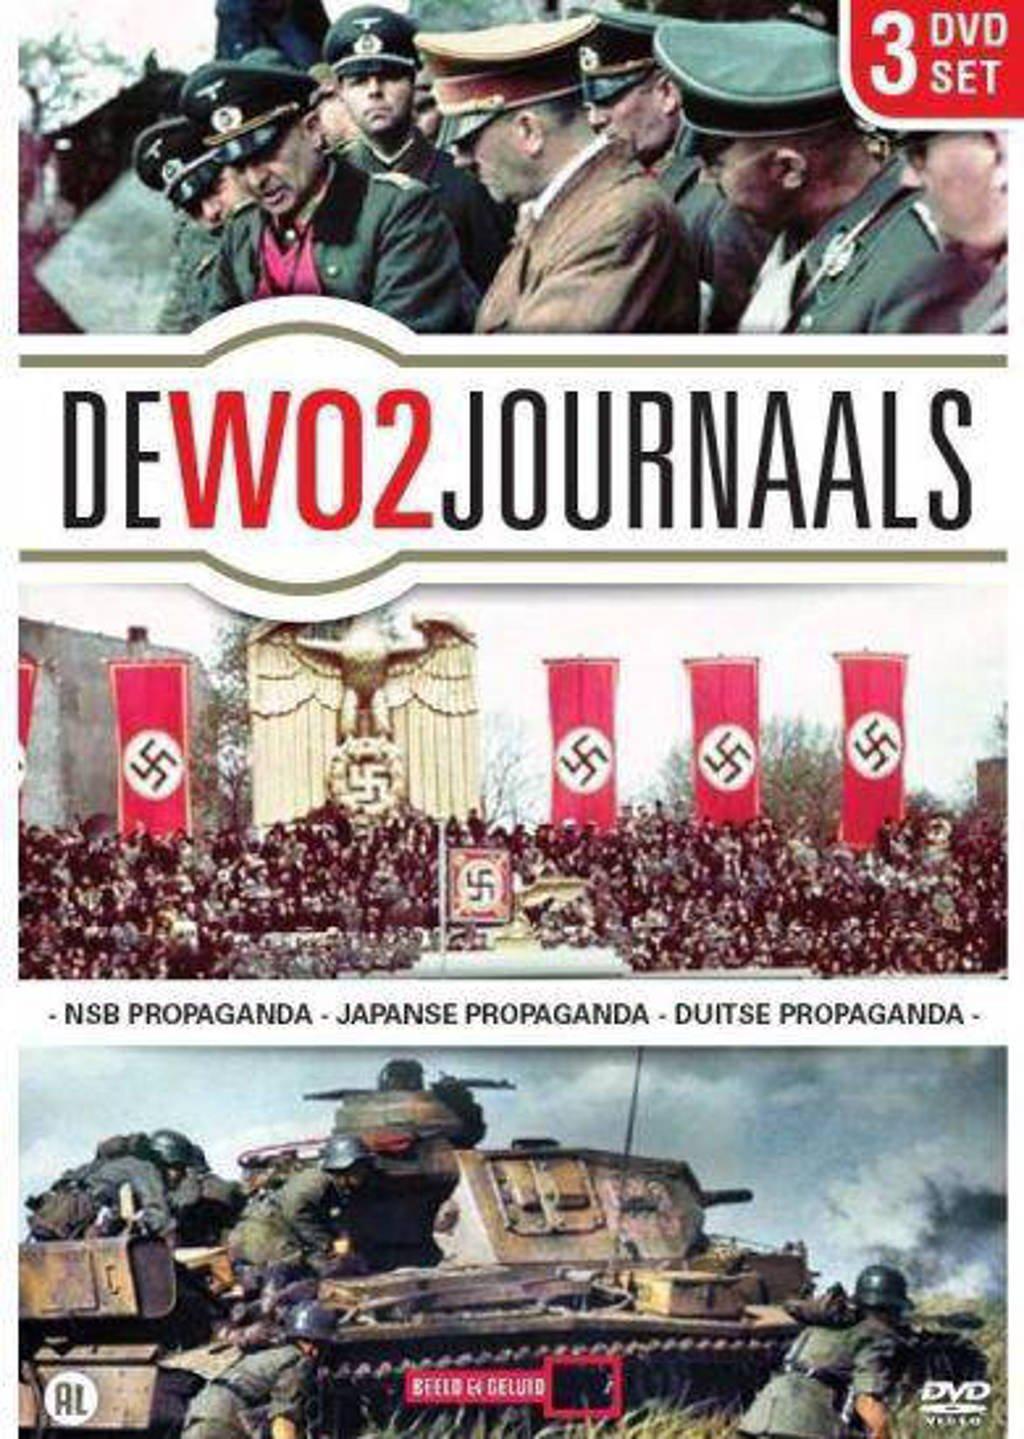 WWII journaals (DVD)